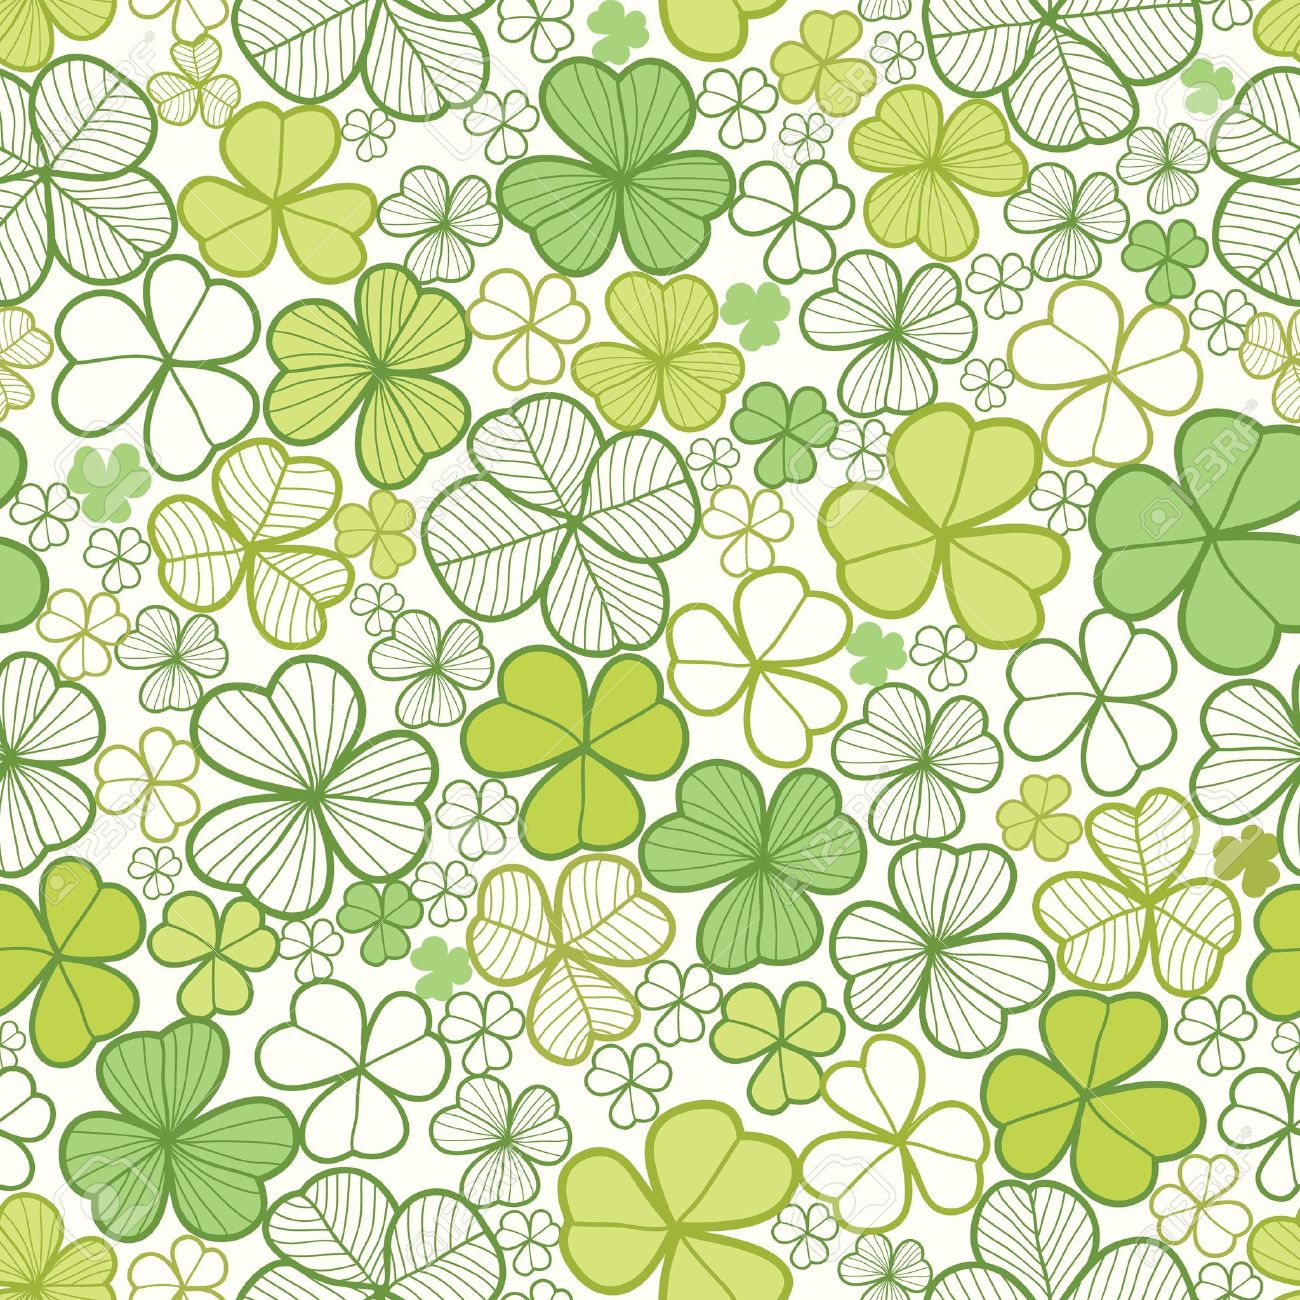 Clover line art seamless pattern background Stock Vector - 16675678